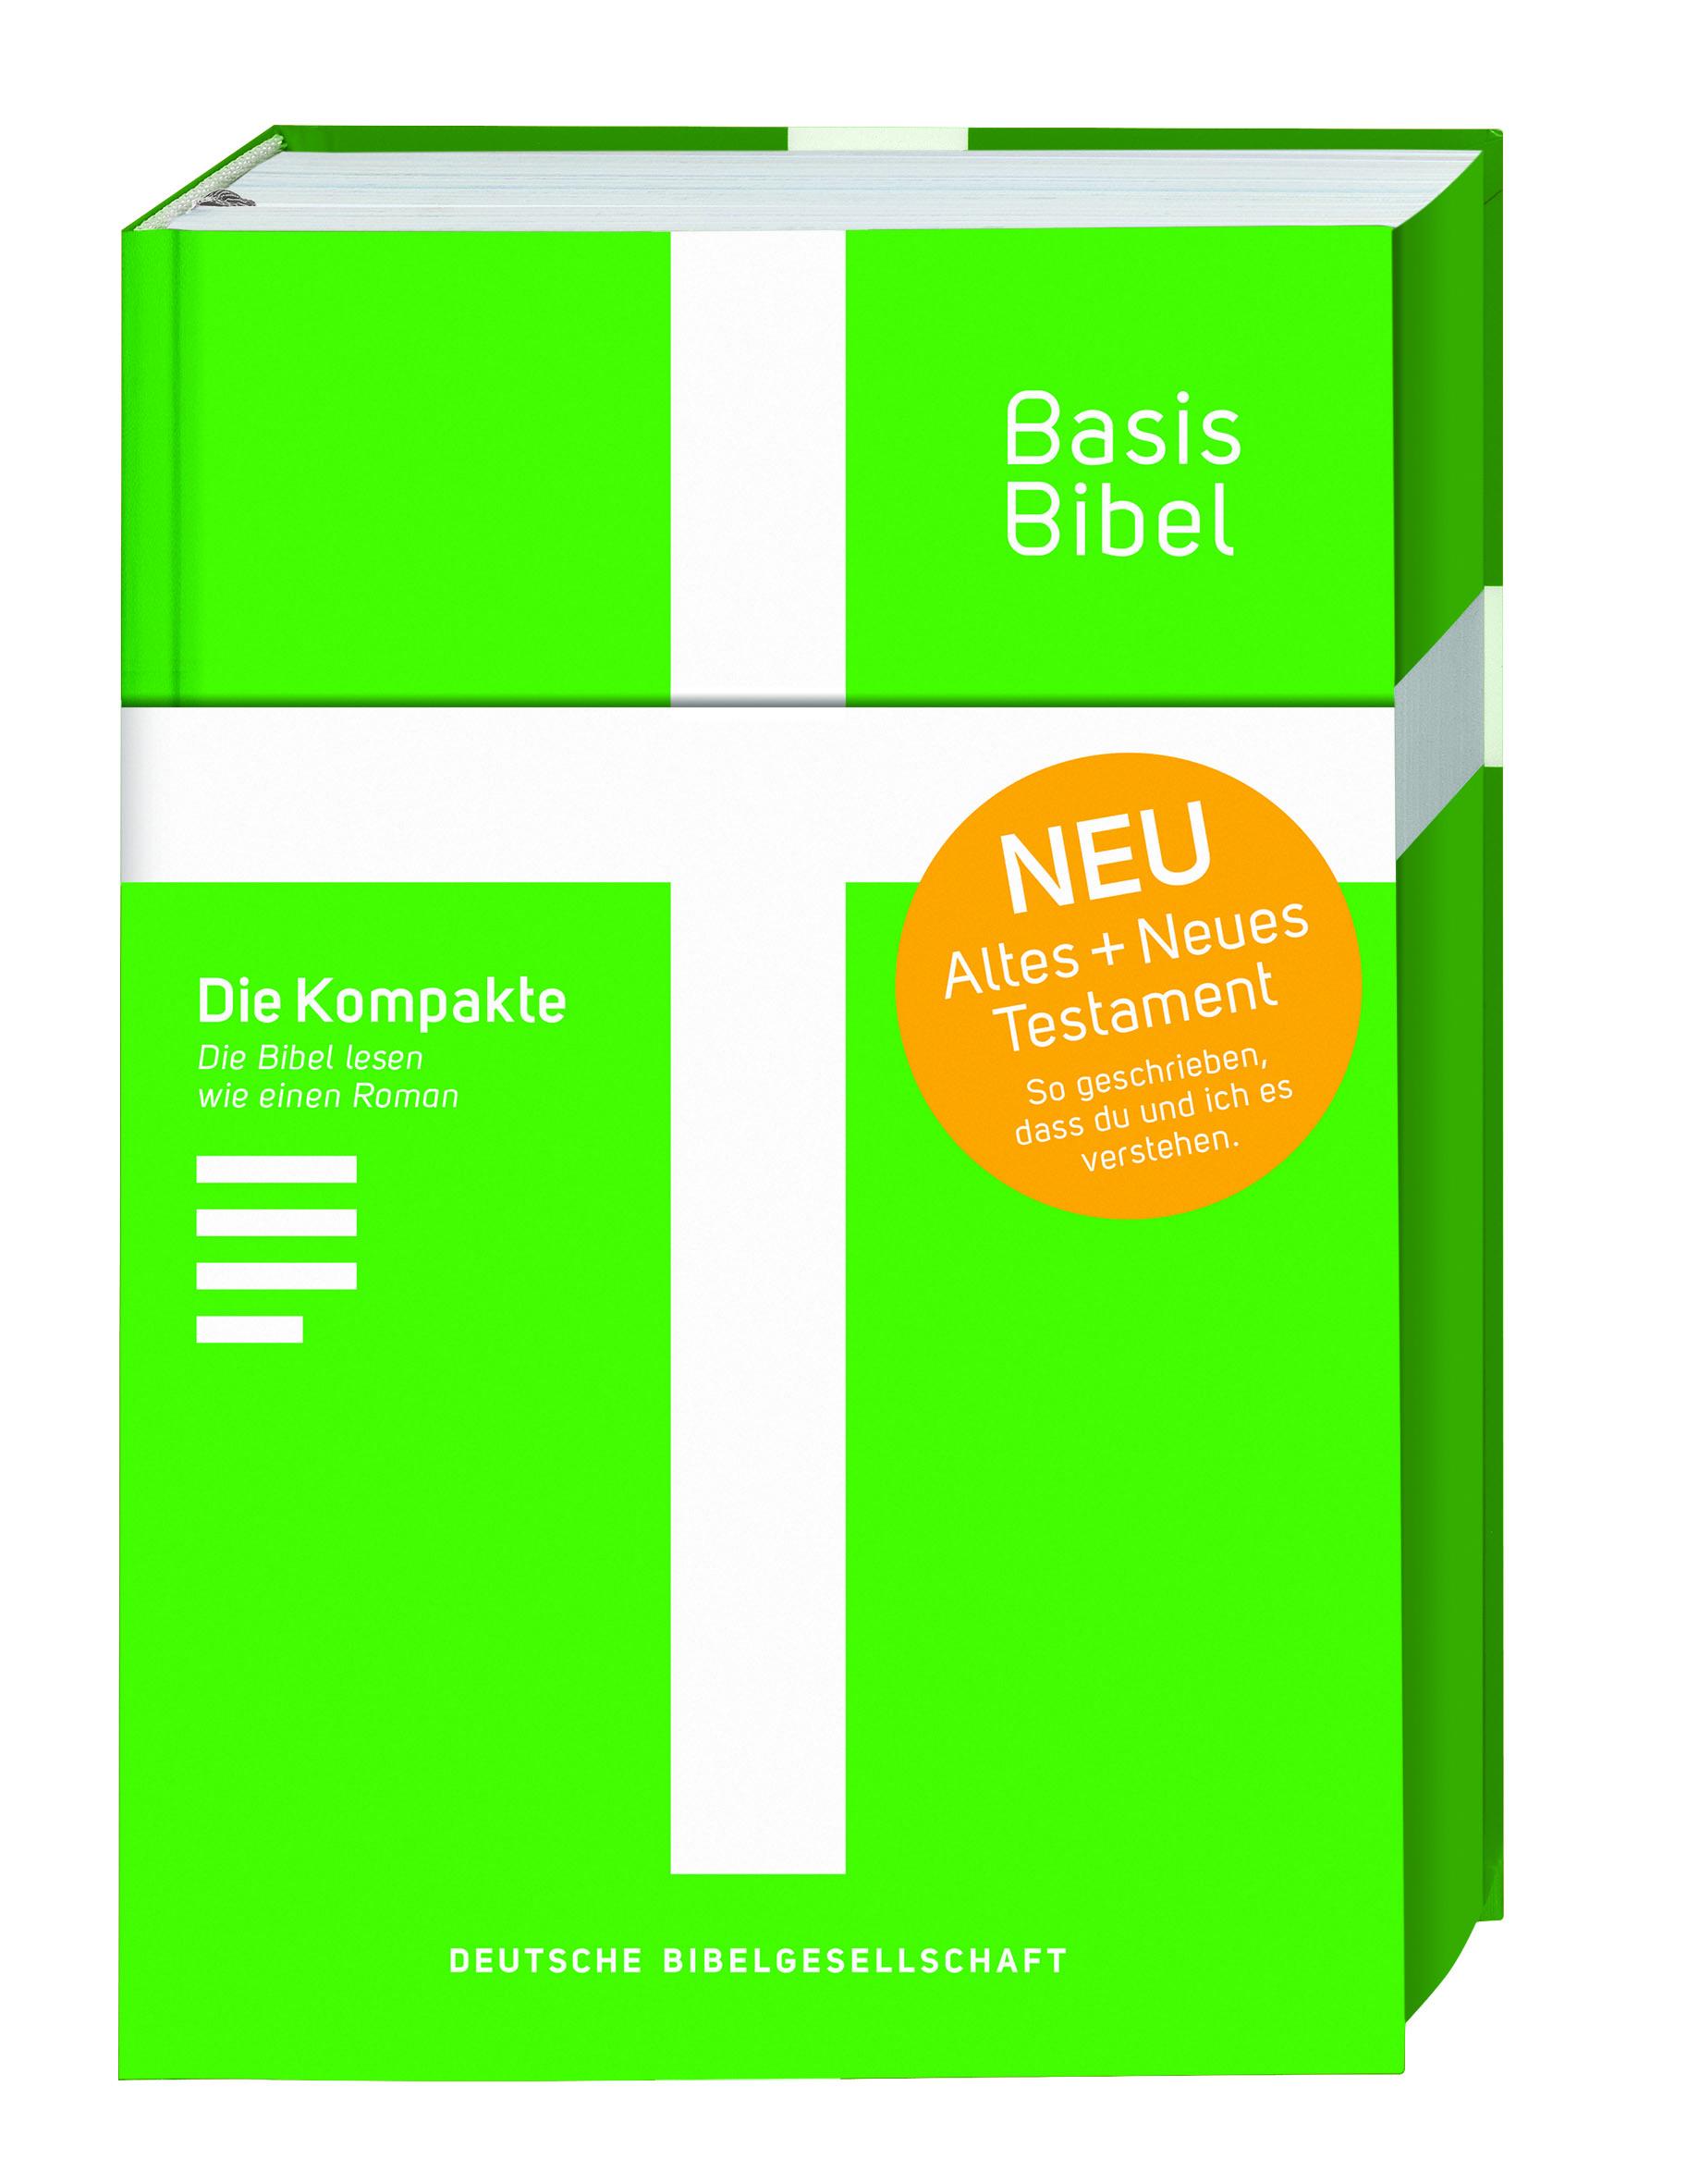 BasisBibel grün - Die Kompakte!